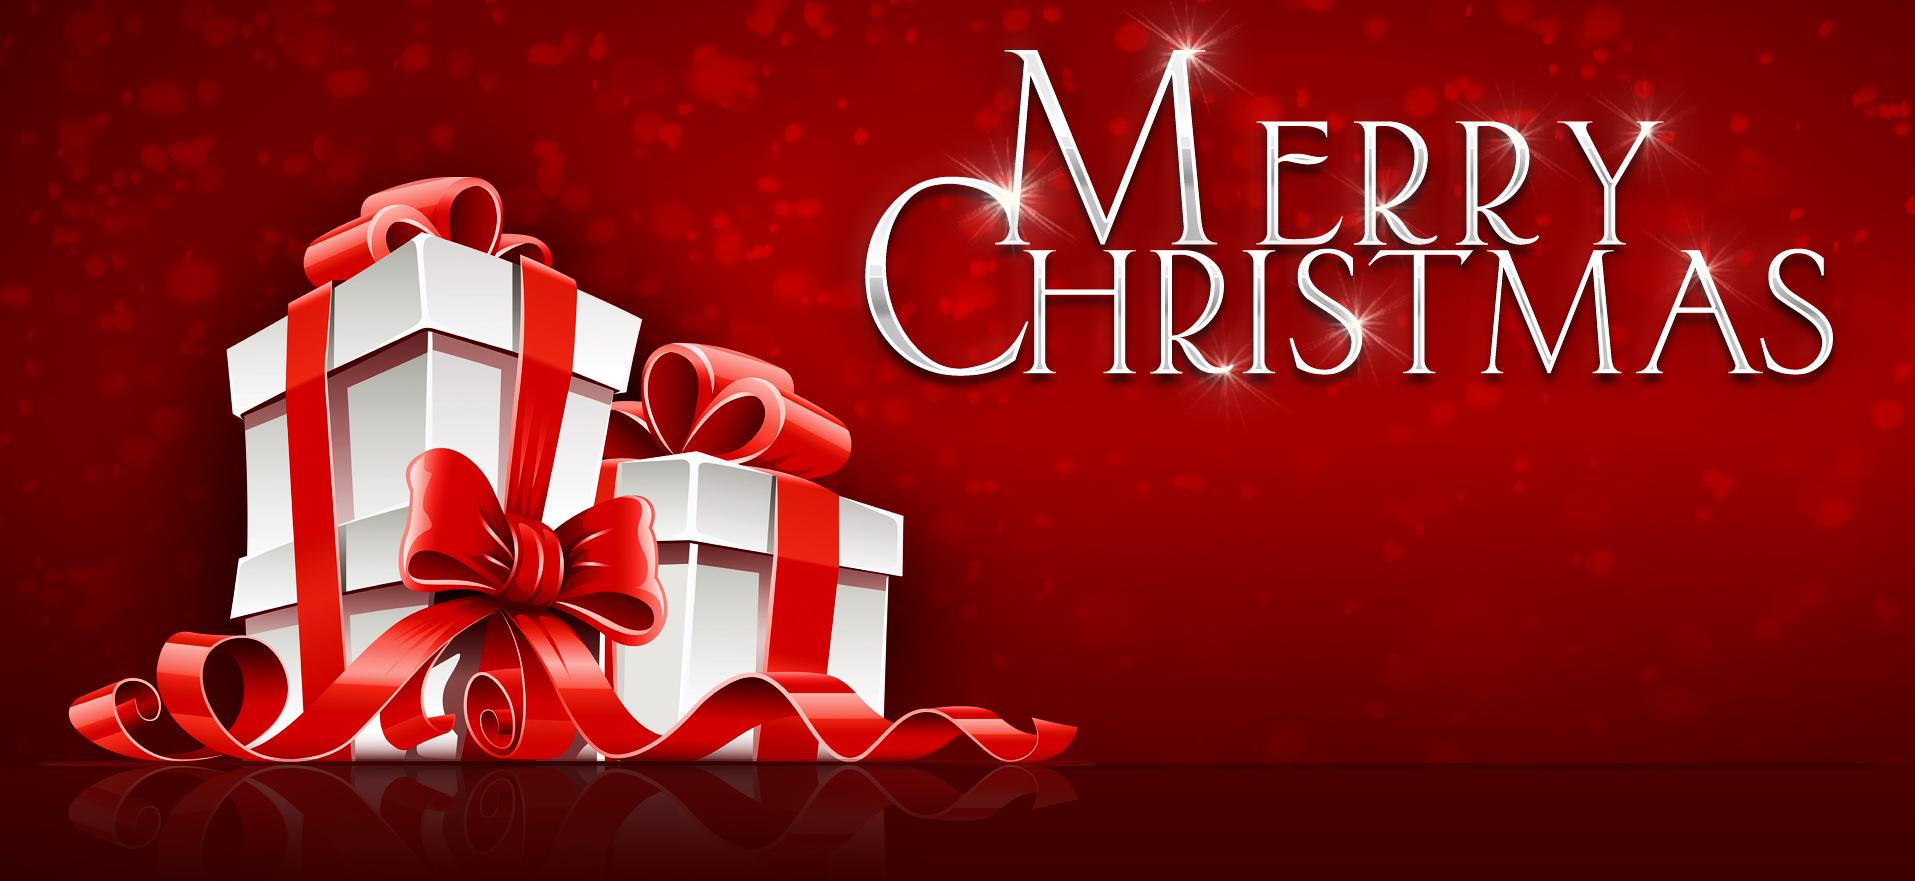 merry christmas wishes.jpg